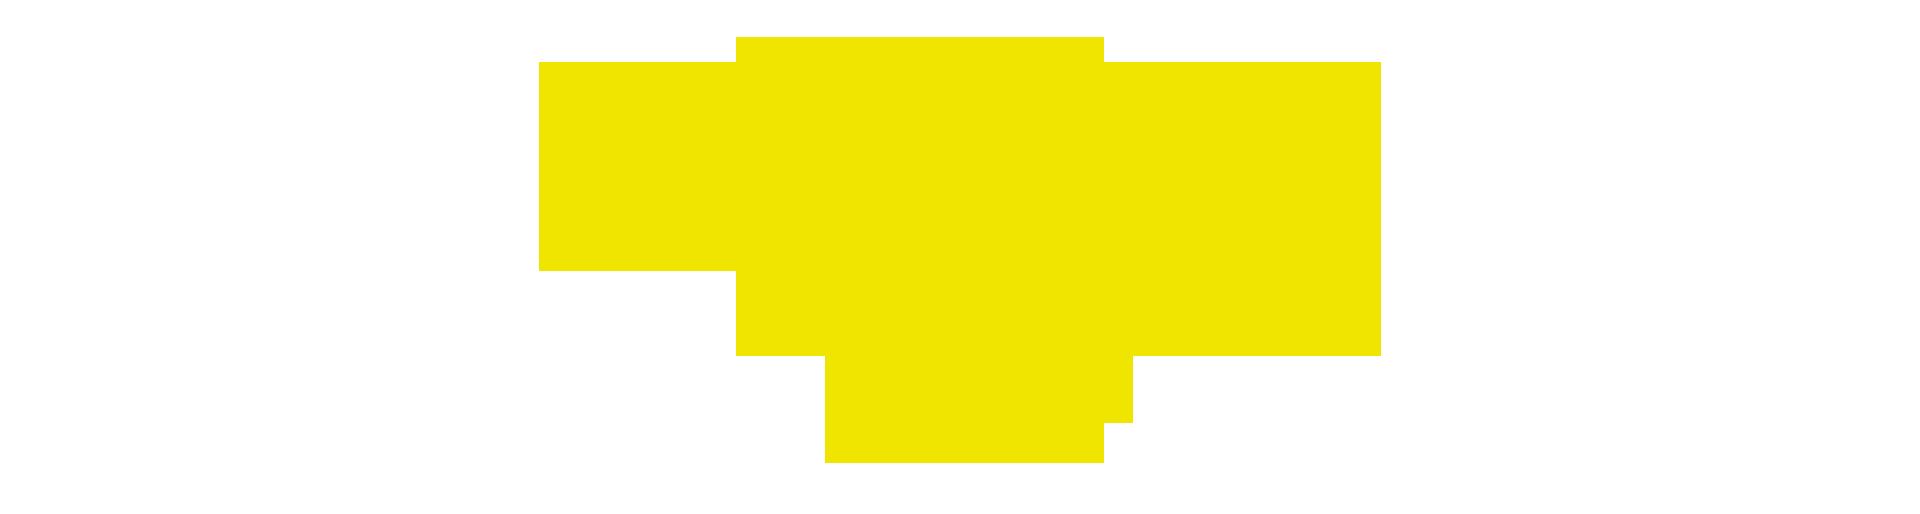 05_relatorio